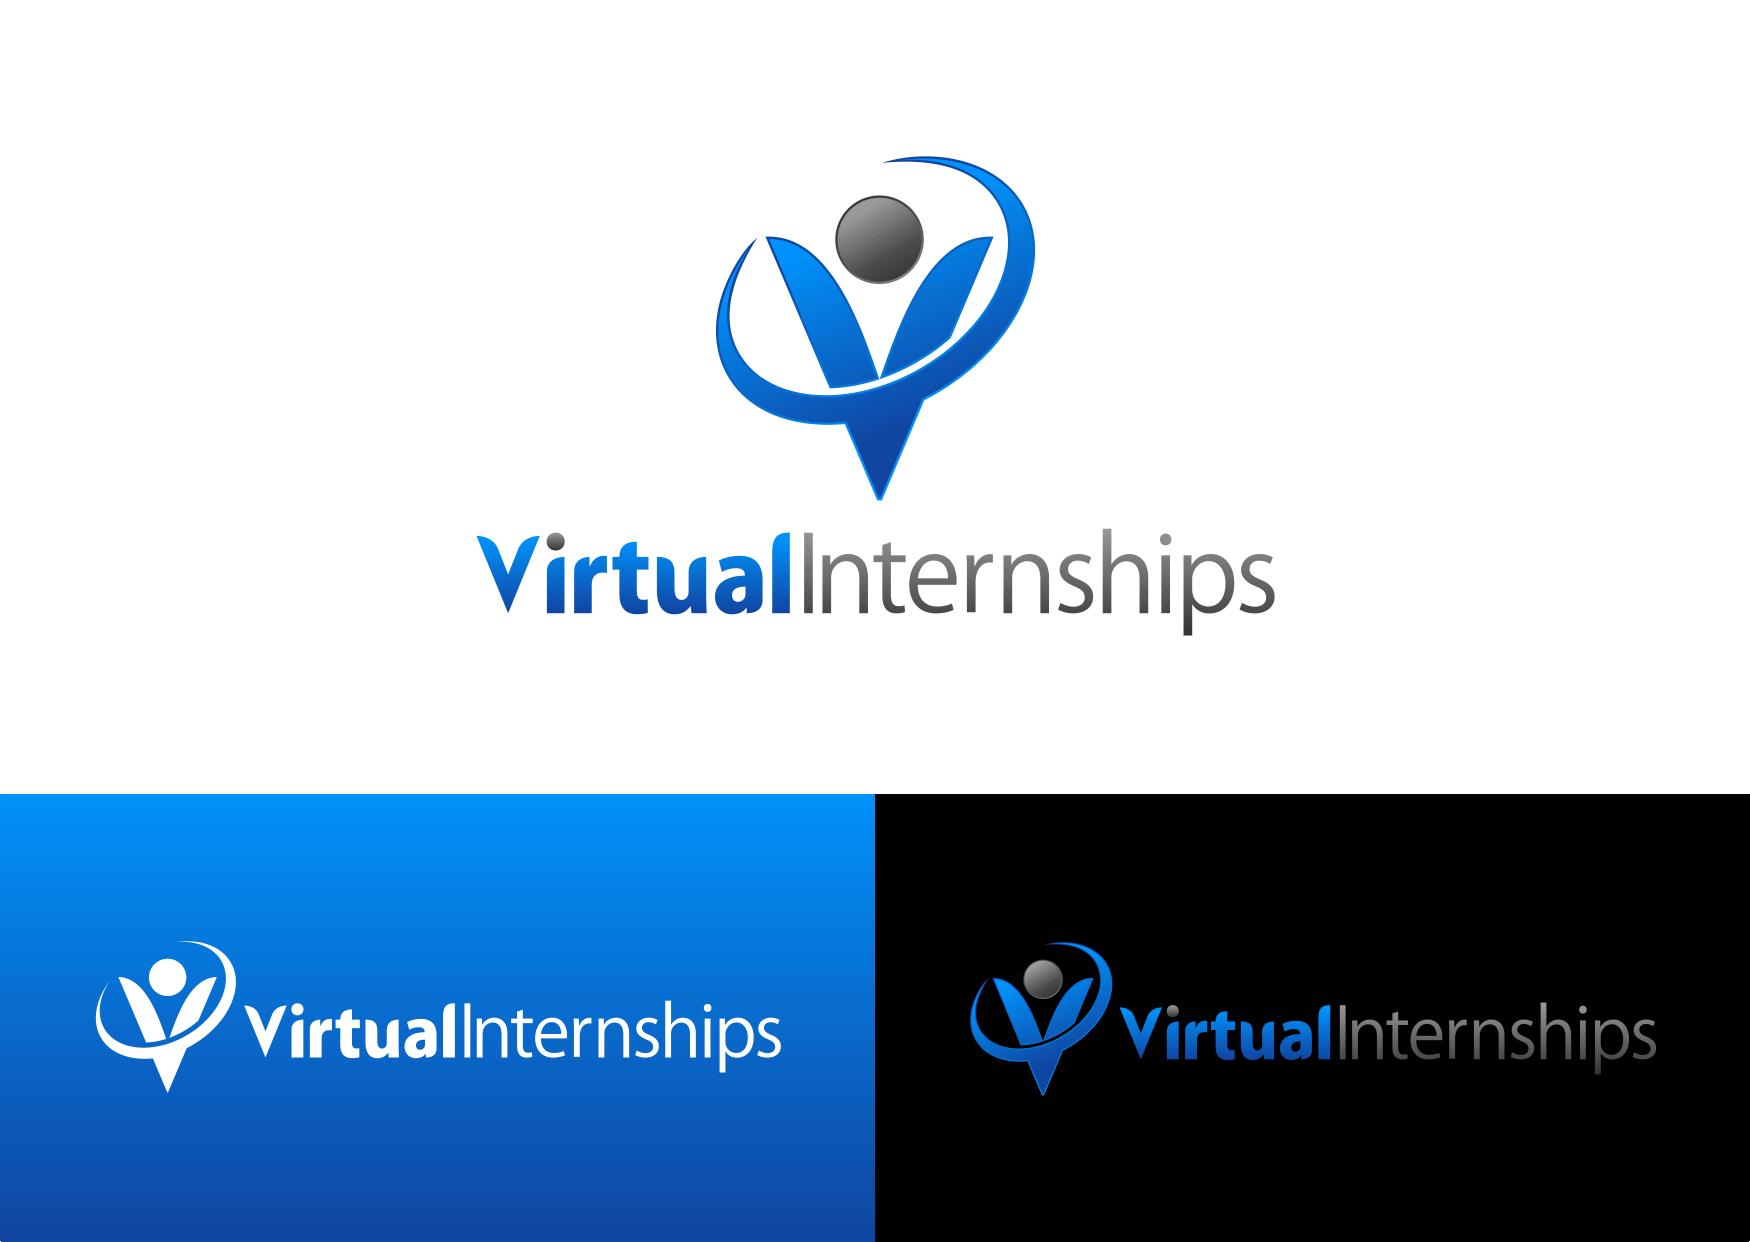 New logo wanted for Virtual Internships